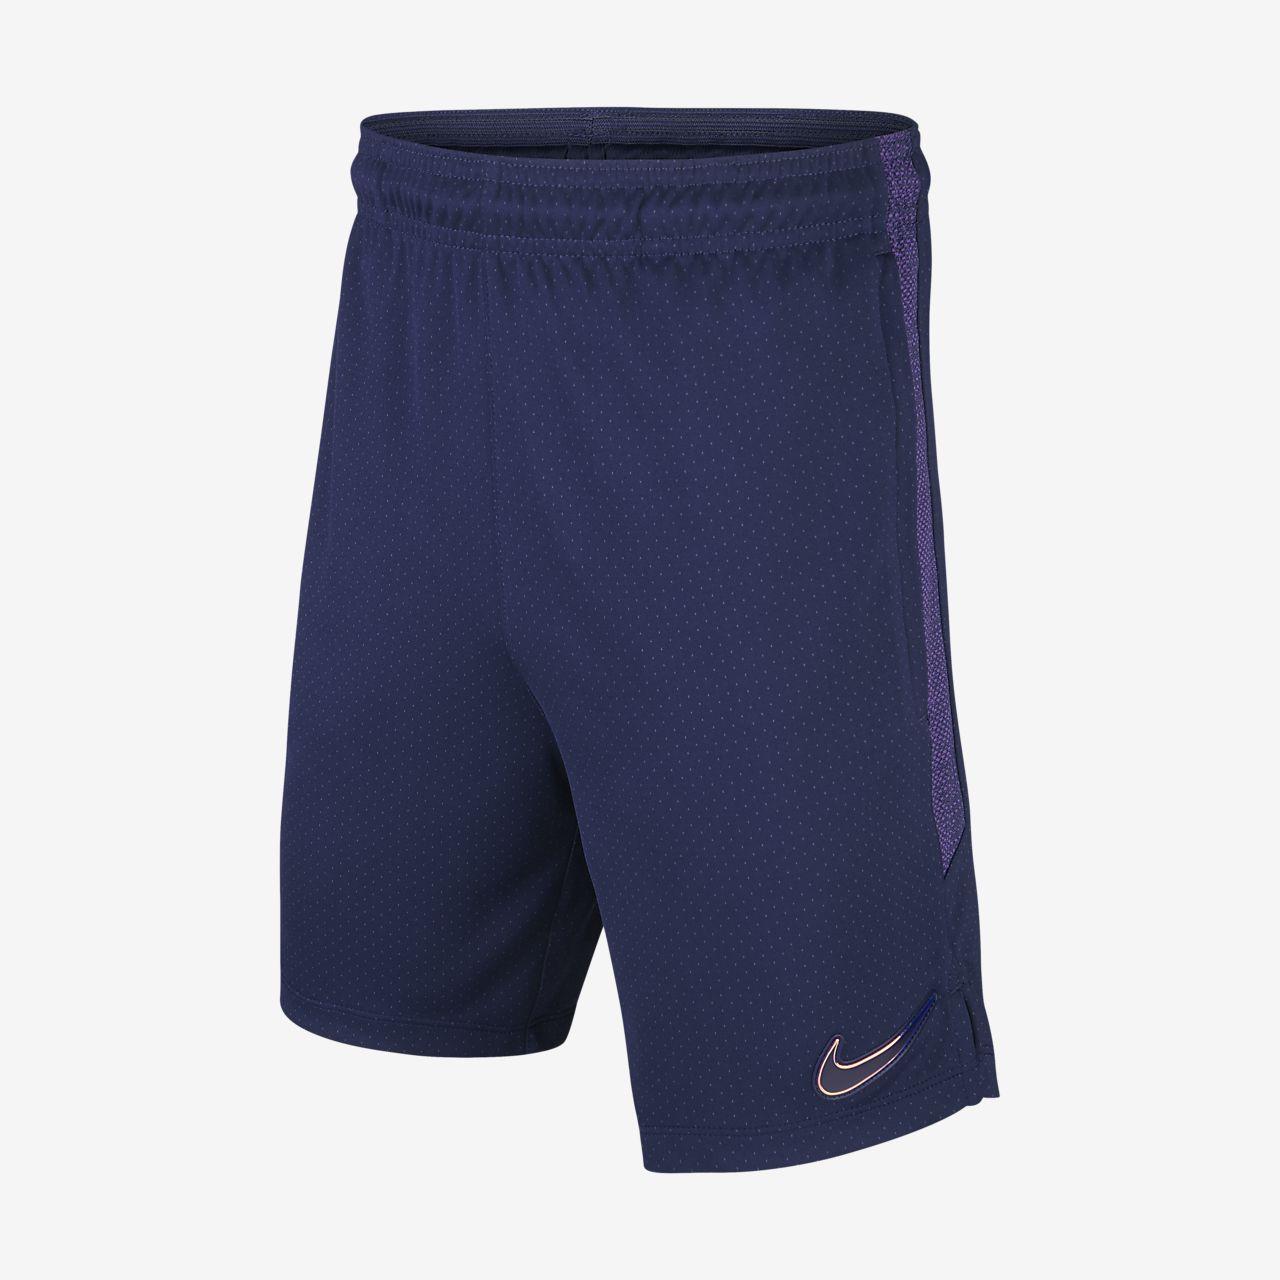 Nike Dri-FIT Tottenham Hotspur Strike Pantalons curts de futbol - Nen/a